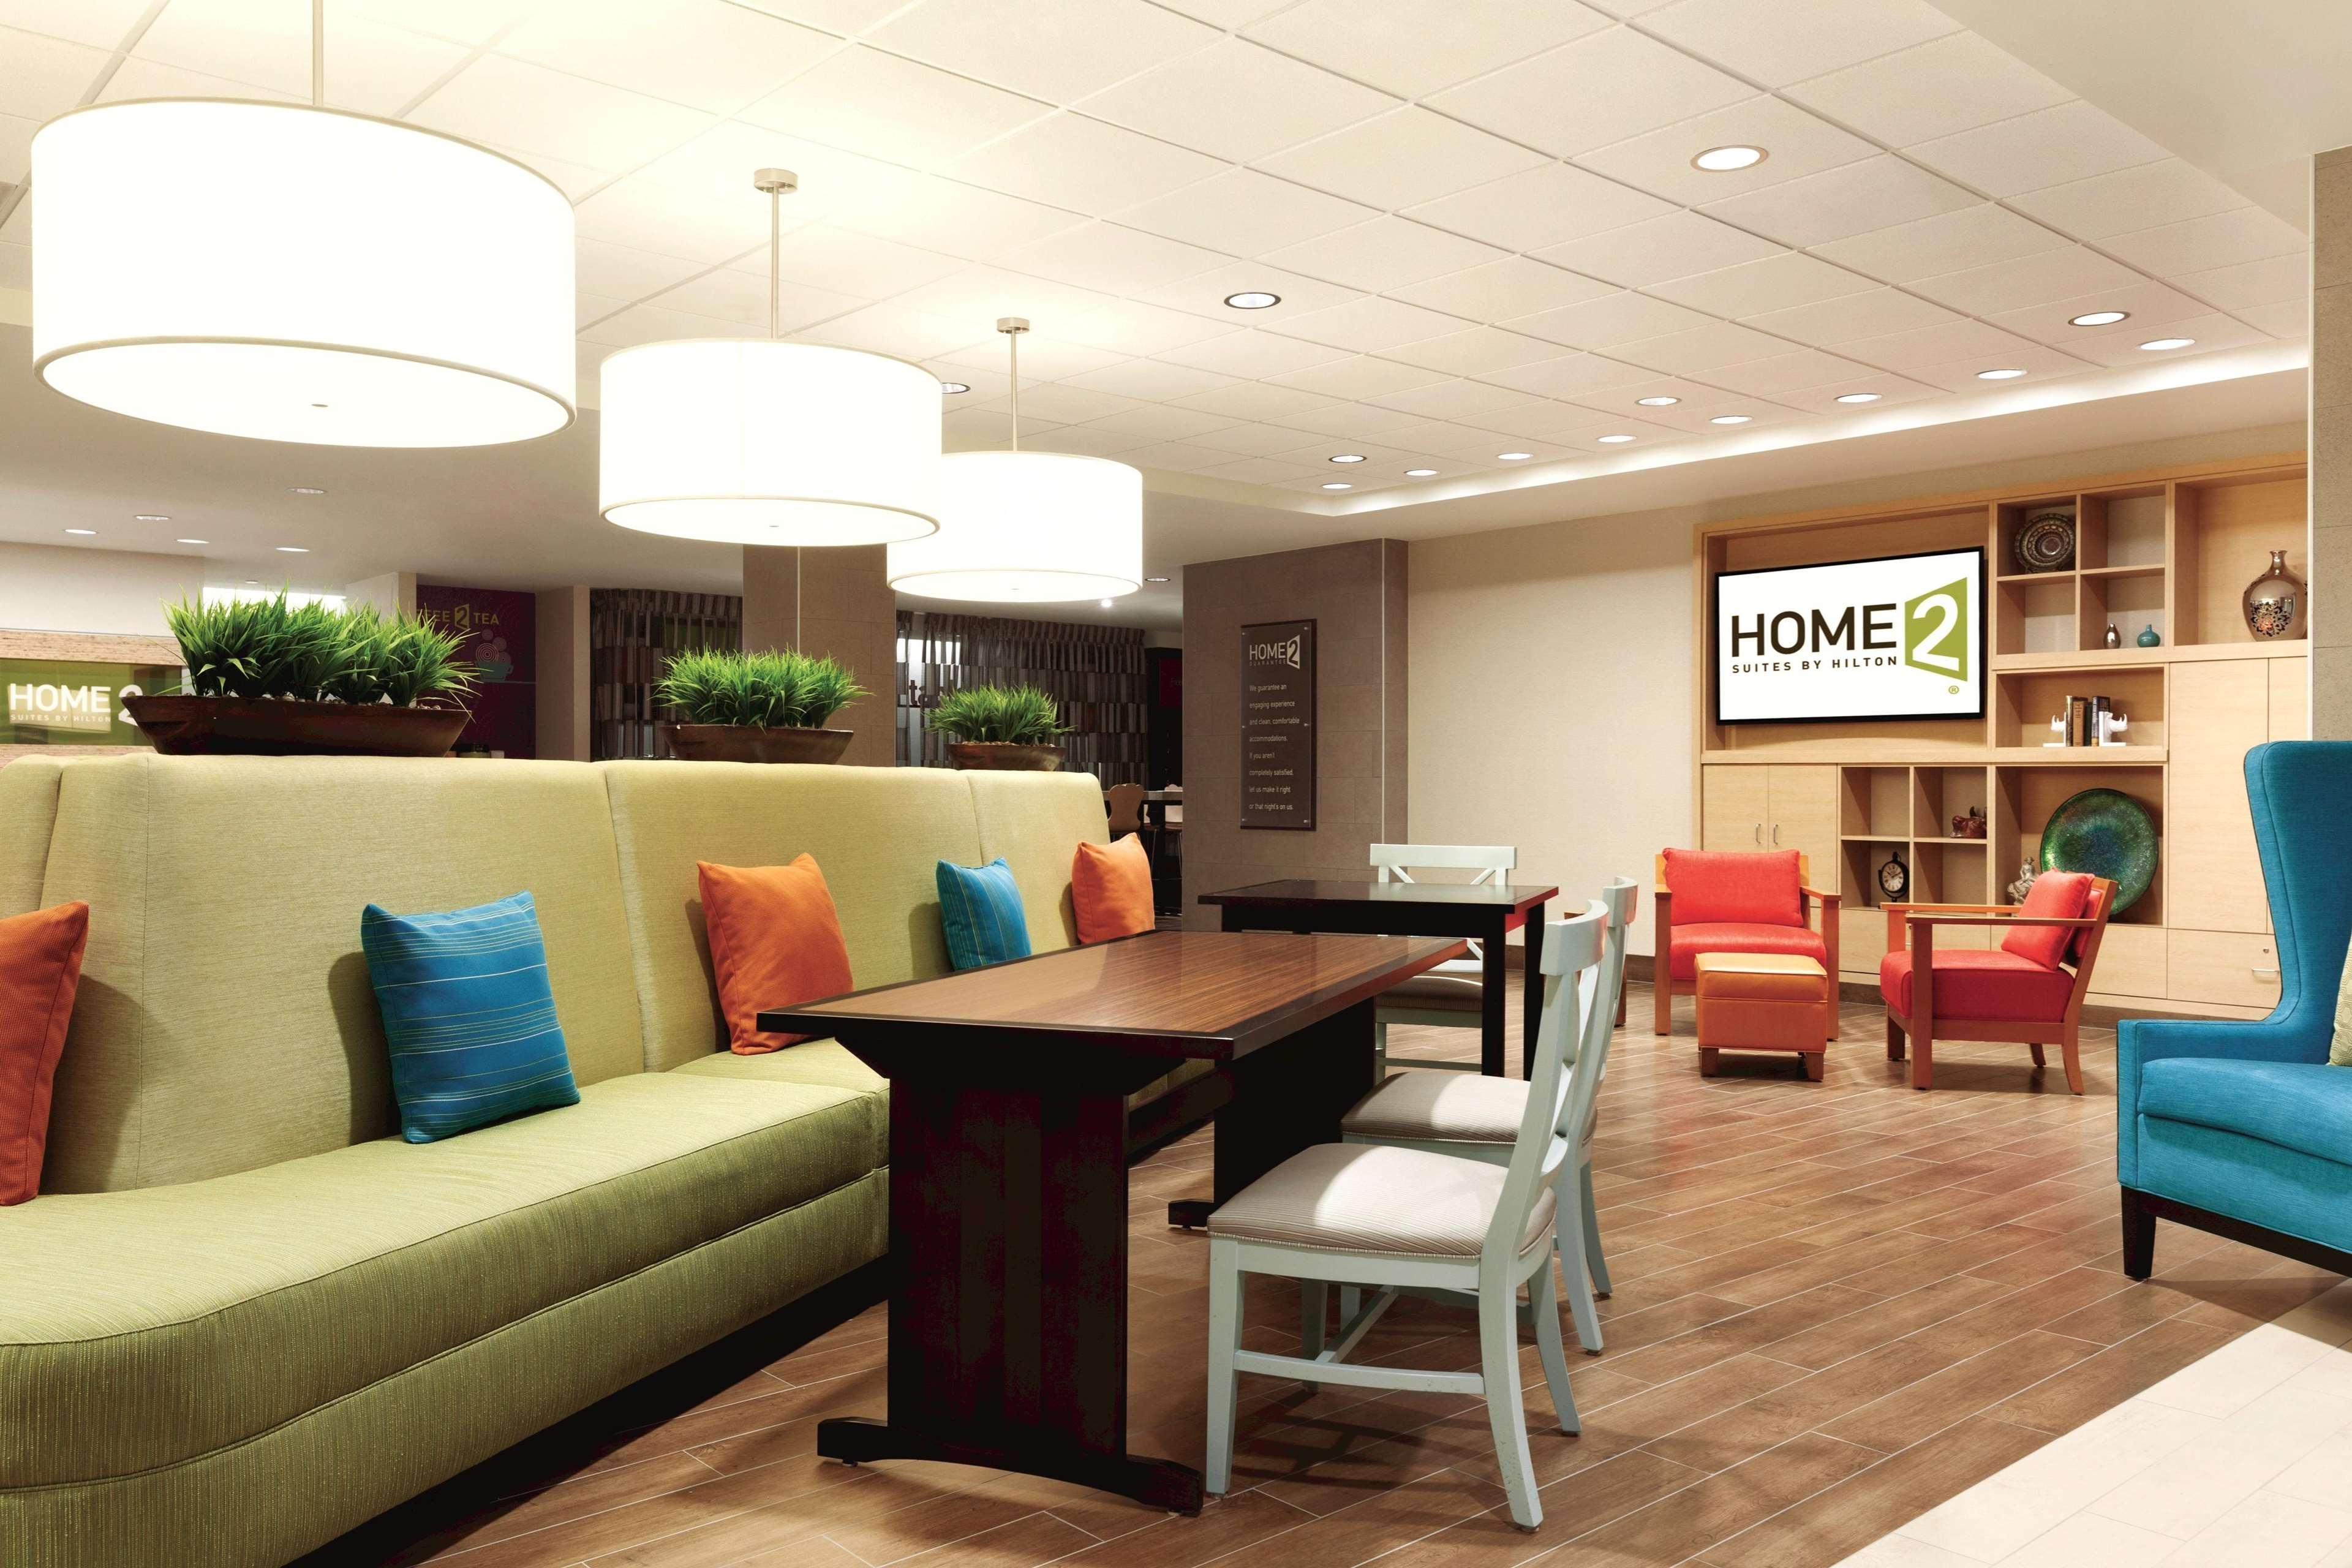 Home2 Suites by Hilton Austin Round Rock image 2